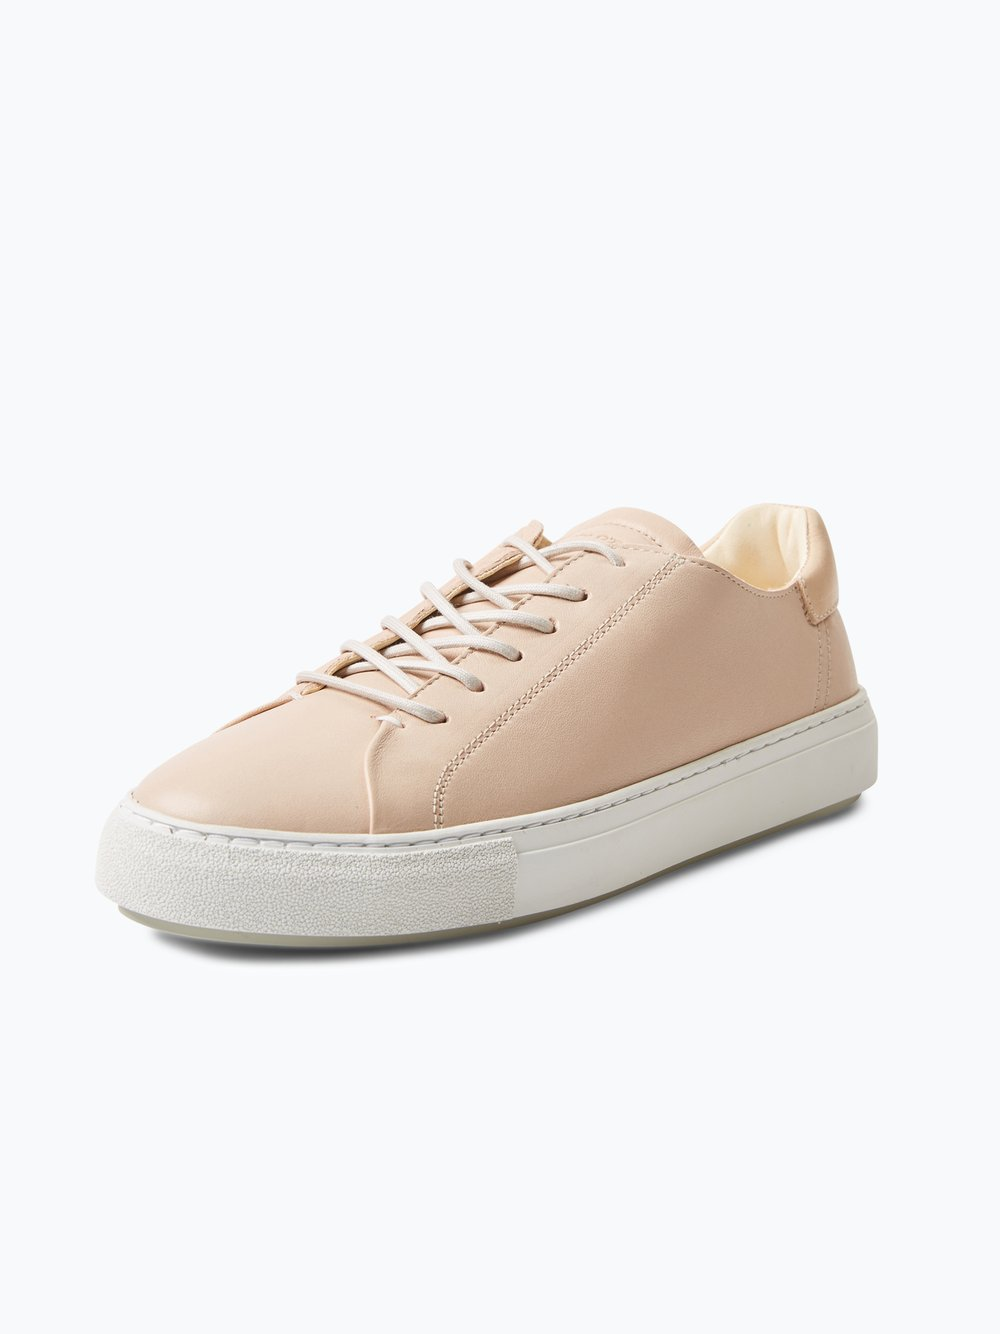 Marc O Polo Damen Sneaker aus Leder  2  online kaufen   PEEK-UND ... f24469492a